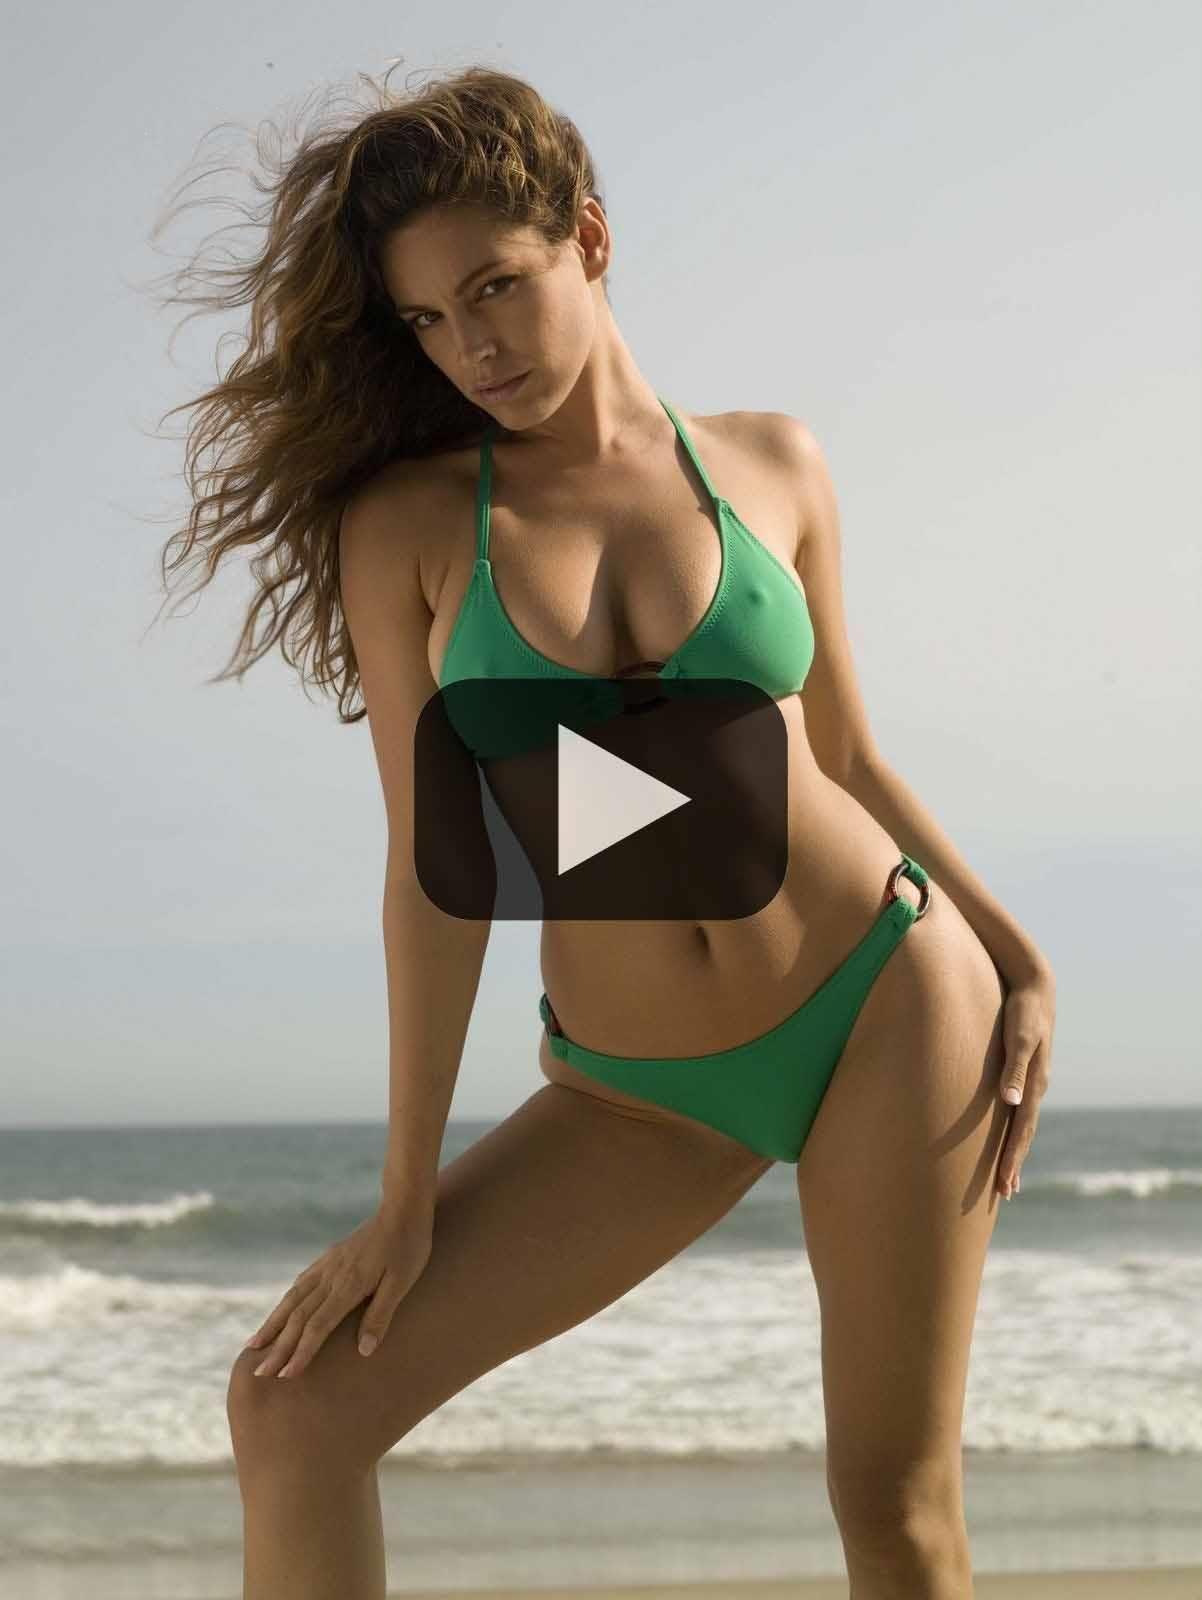 Female Pov Porn within parody movies #sex #porn #video #phote #hot #girls #beautiful